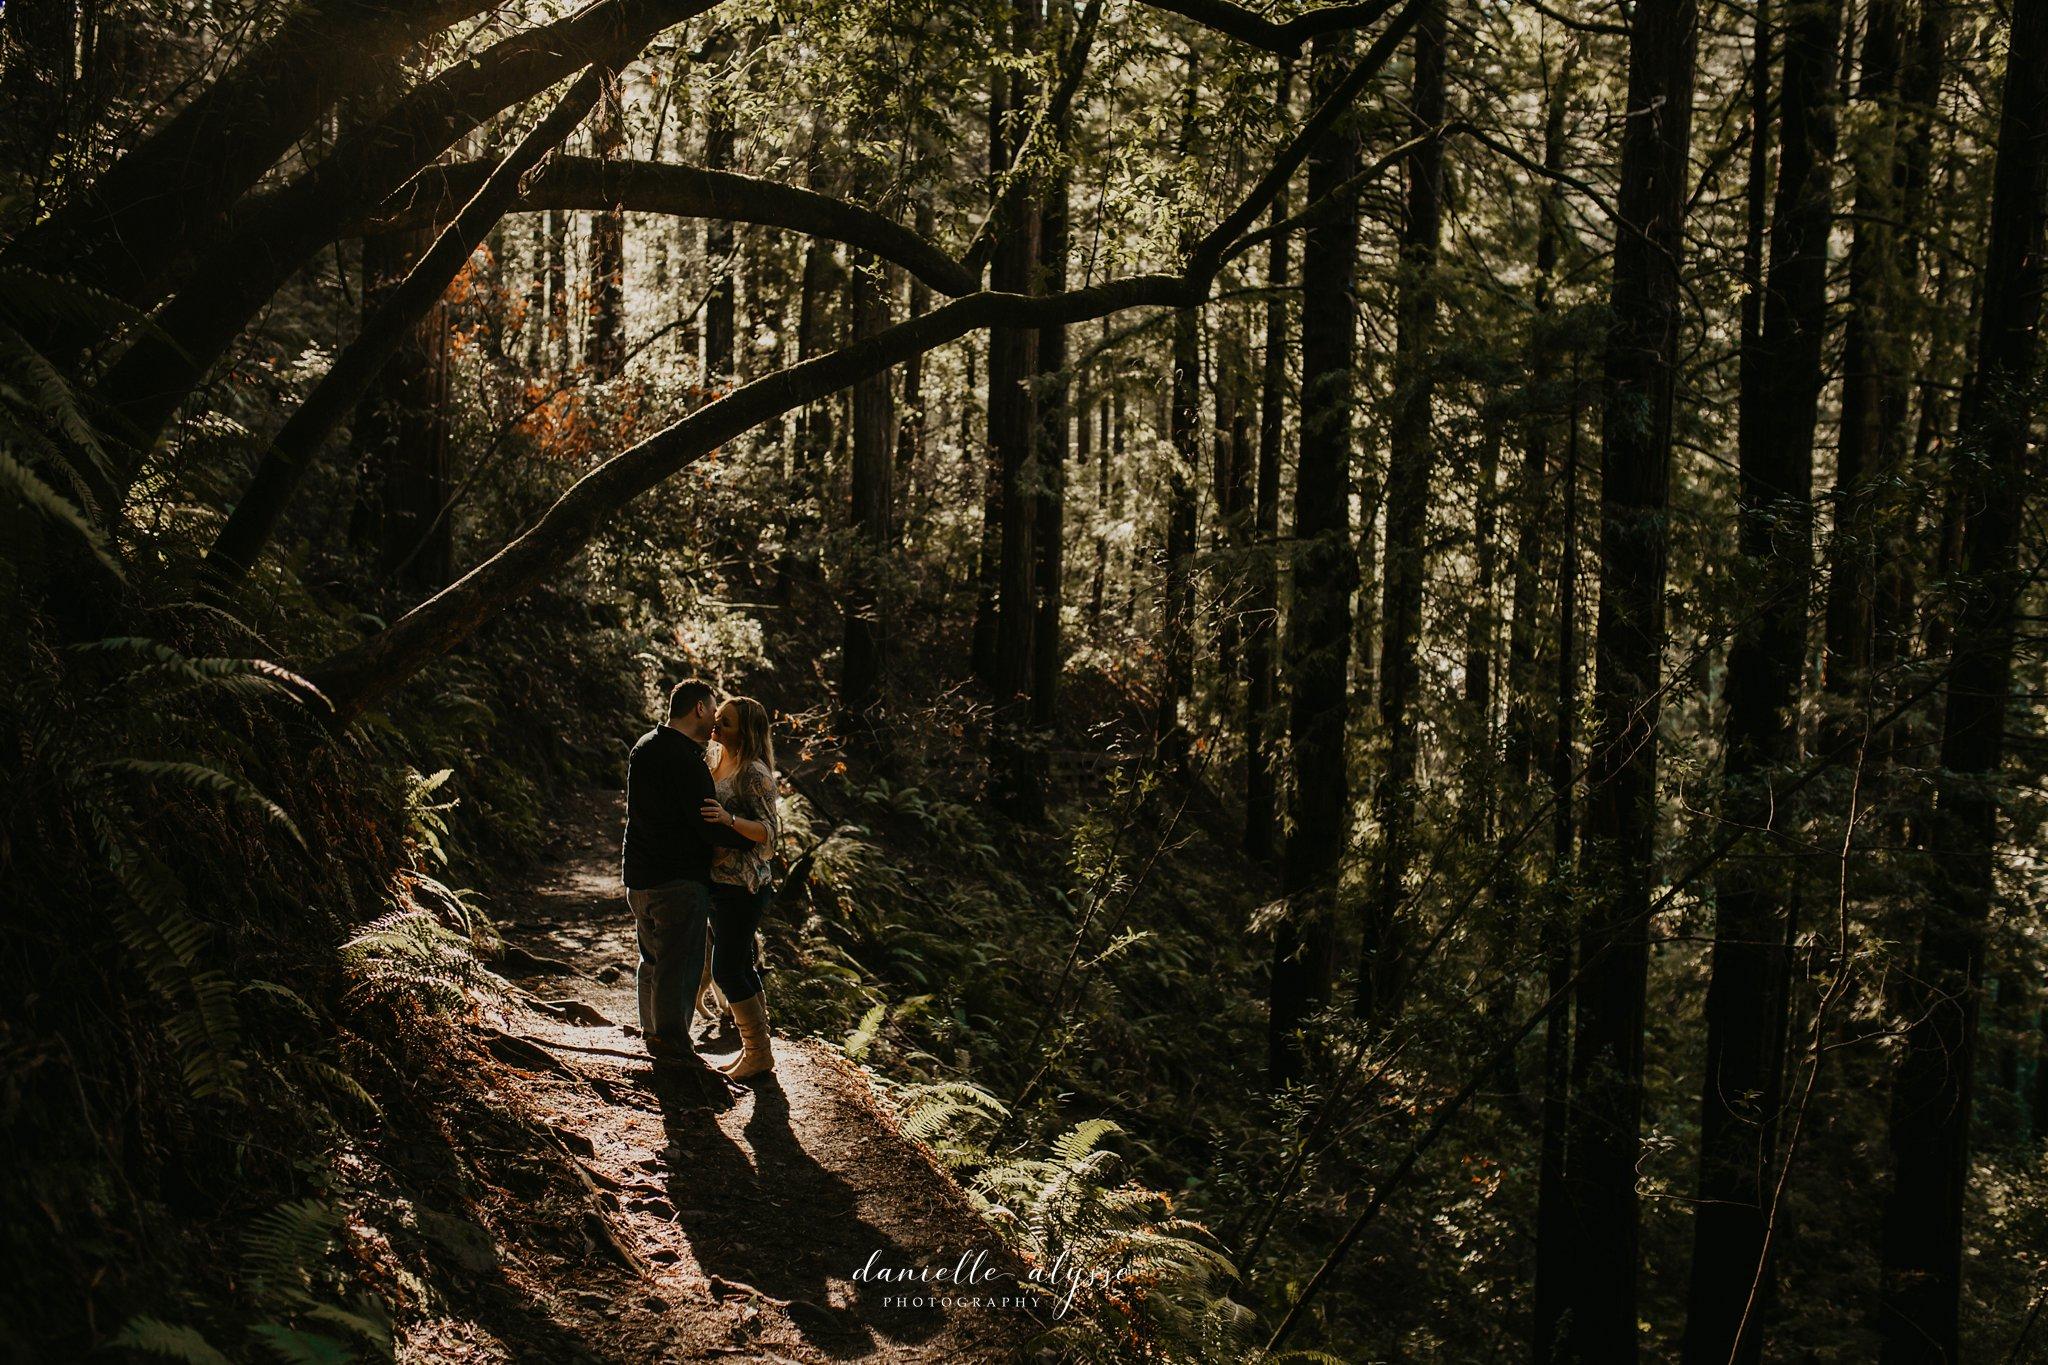 190205_engagement_jen_steven_muir_woods_mill_valley_danielle_alysse_photography_peek_3_WEB.jpg